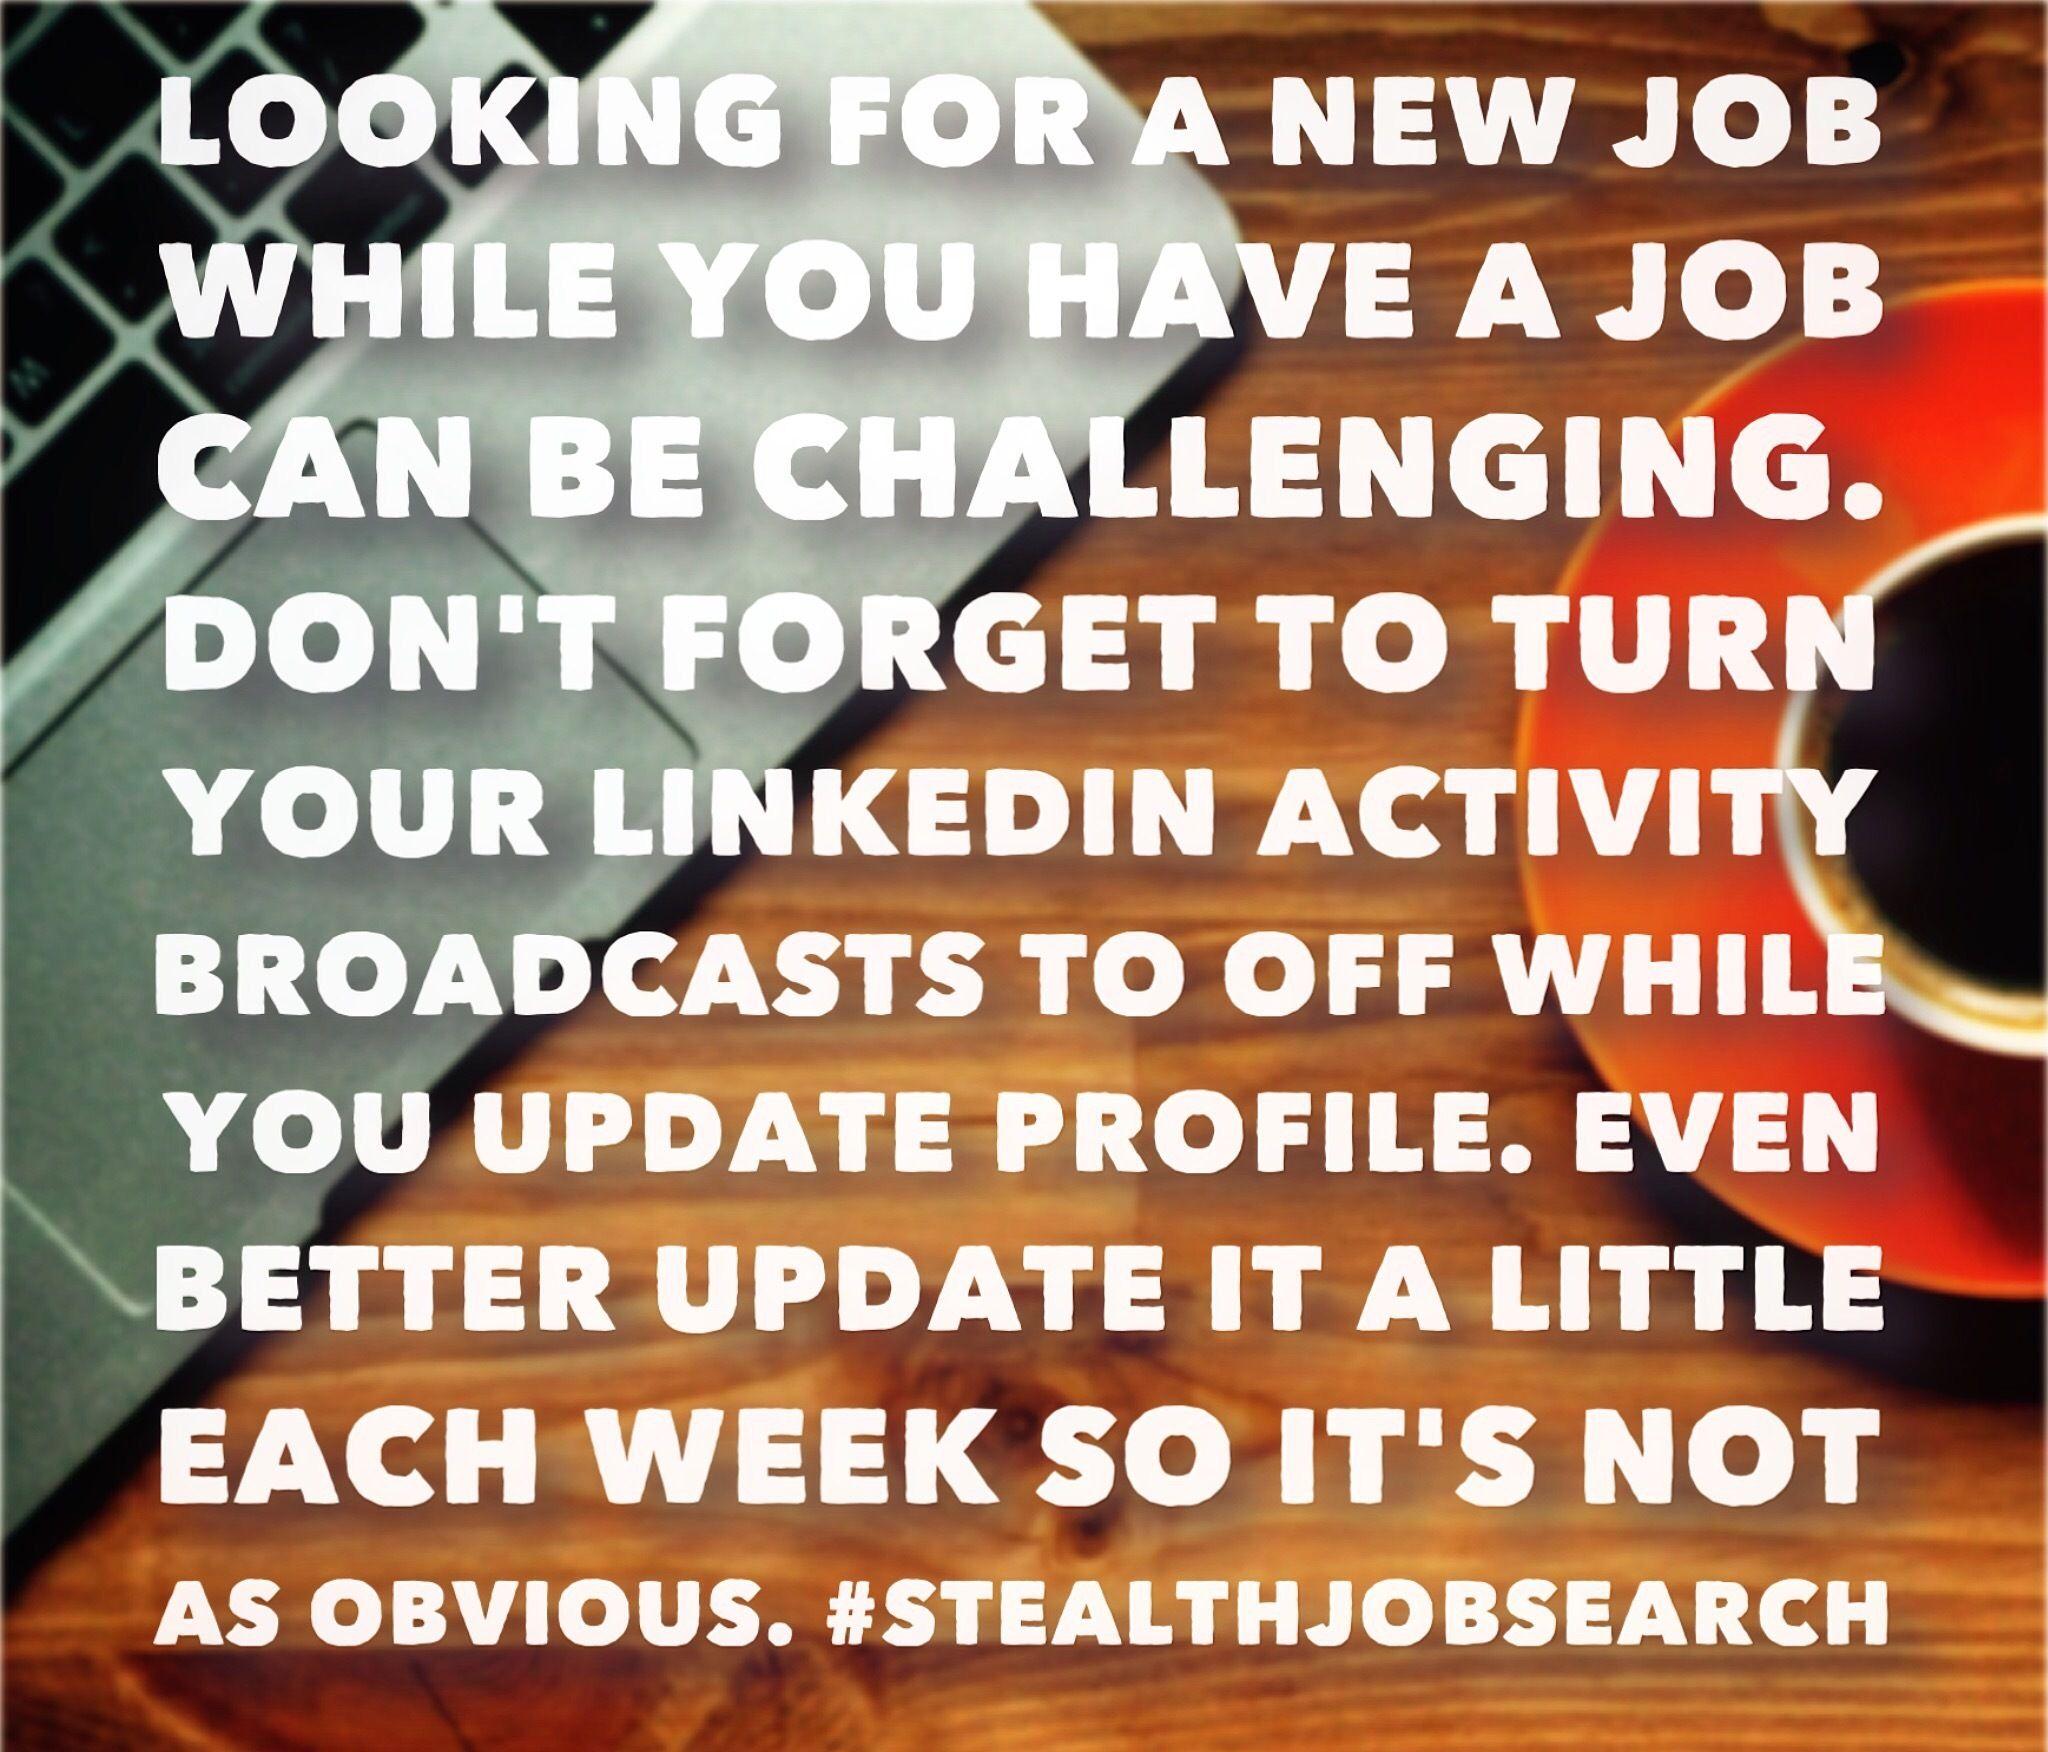 5 choices every job seeker makes job seeker job job search